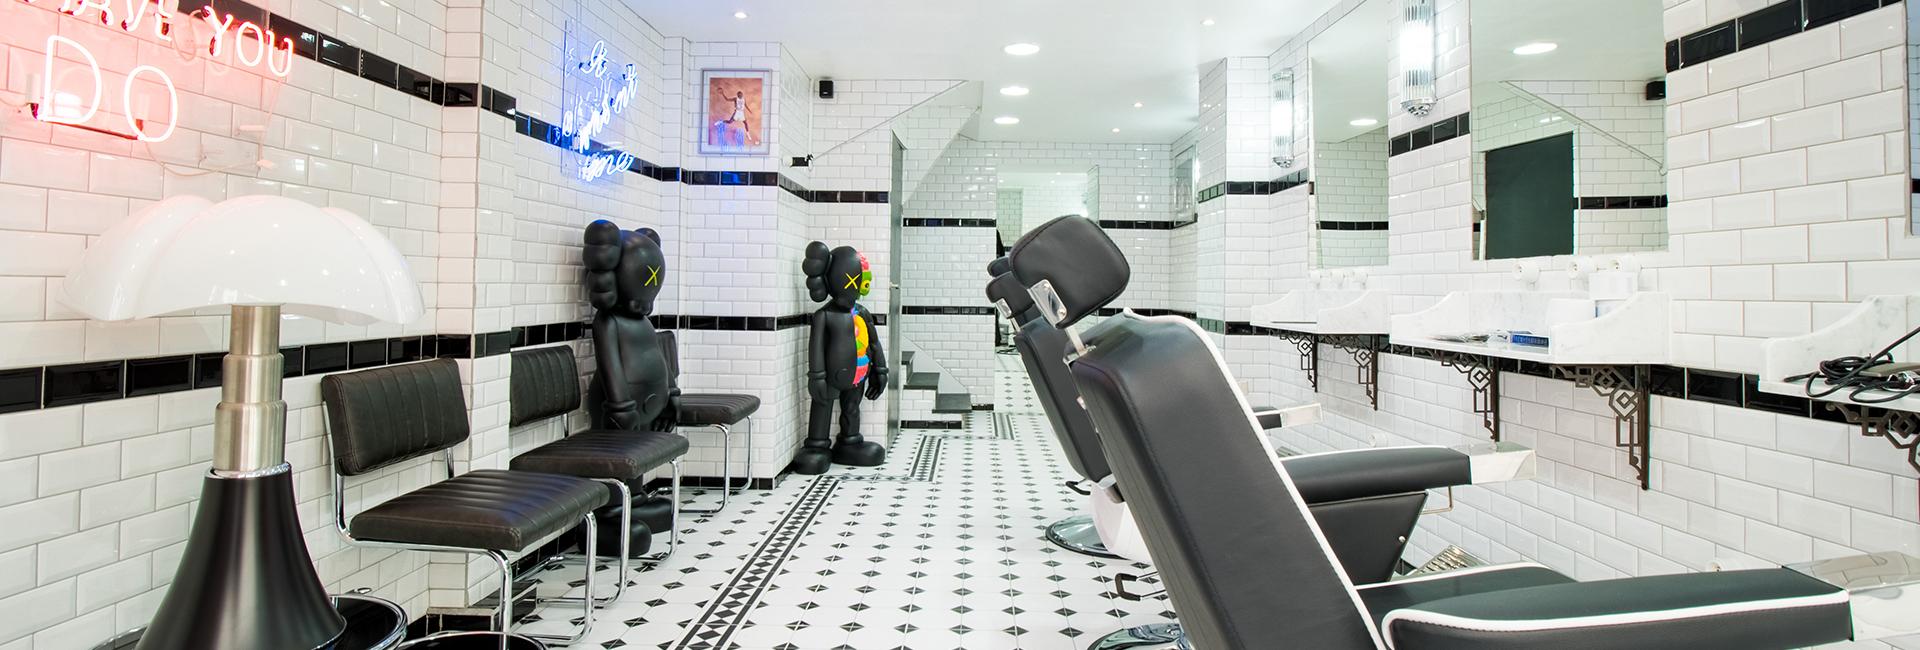 gege-barbershop-paris-blog-beaute-soin-parfum-homme